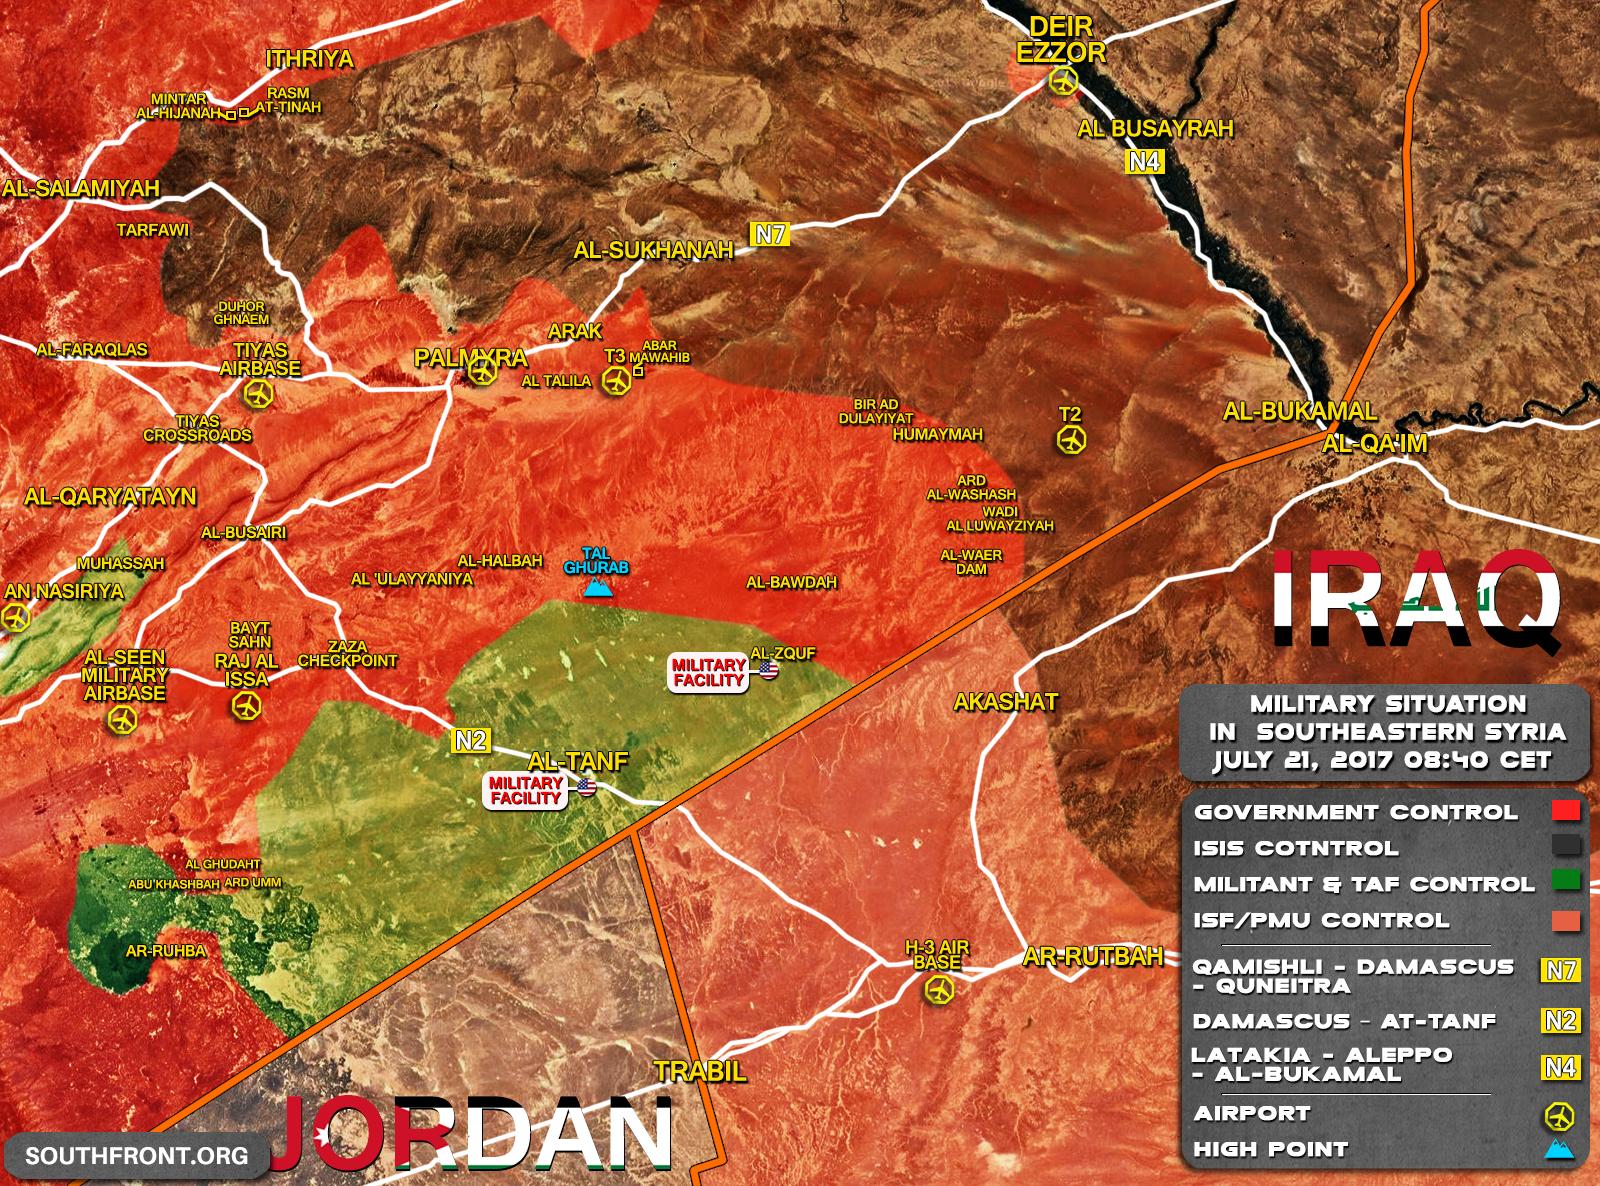 BREAKING - [BIZTPOL] Szíria és Irak - 6. - Page 18 21july_08_40_Southeastern_Syria_War_Map